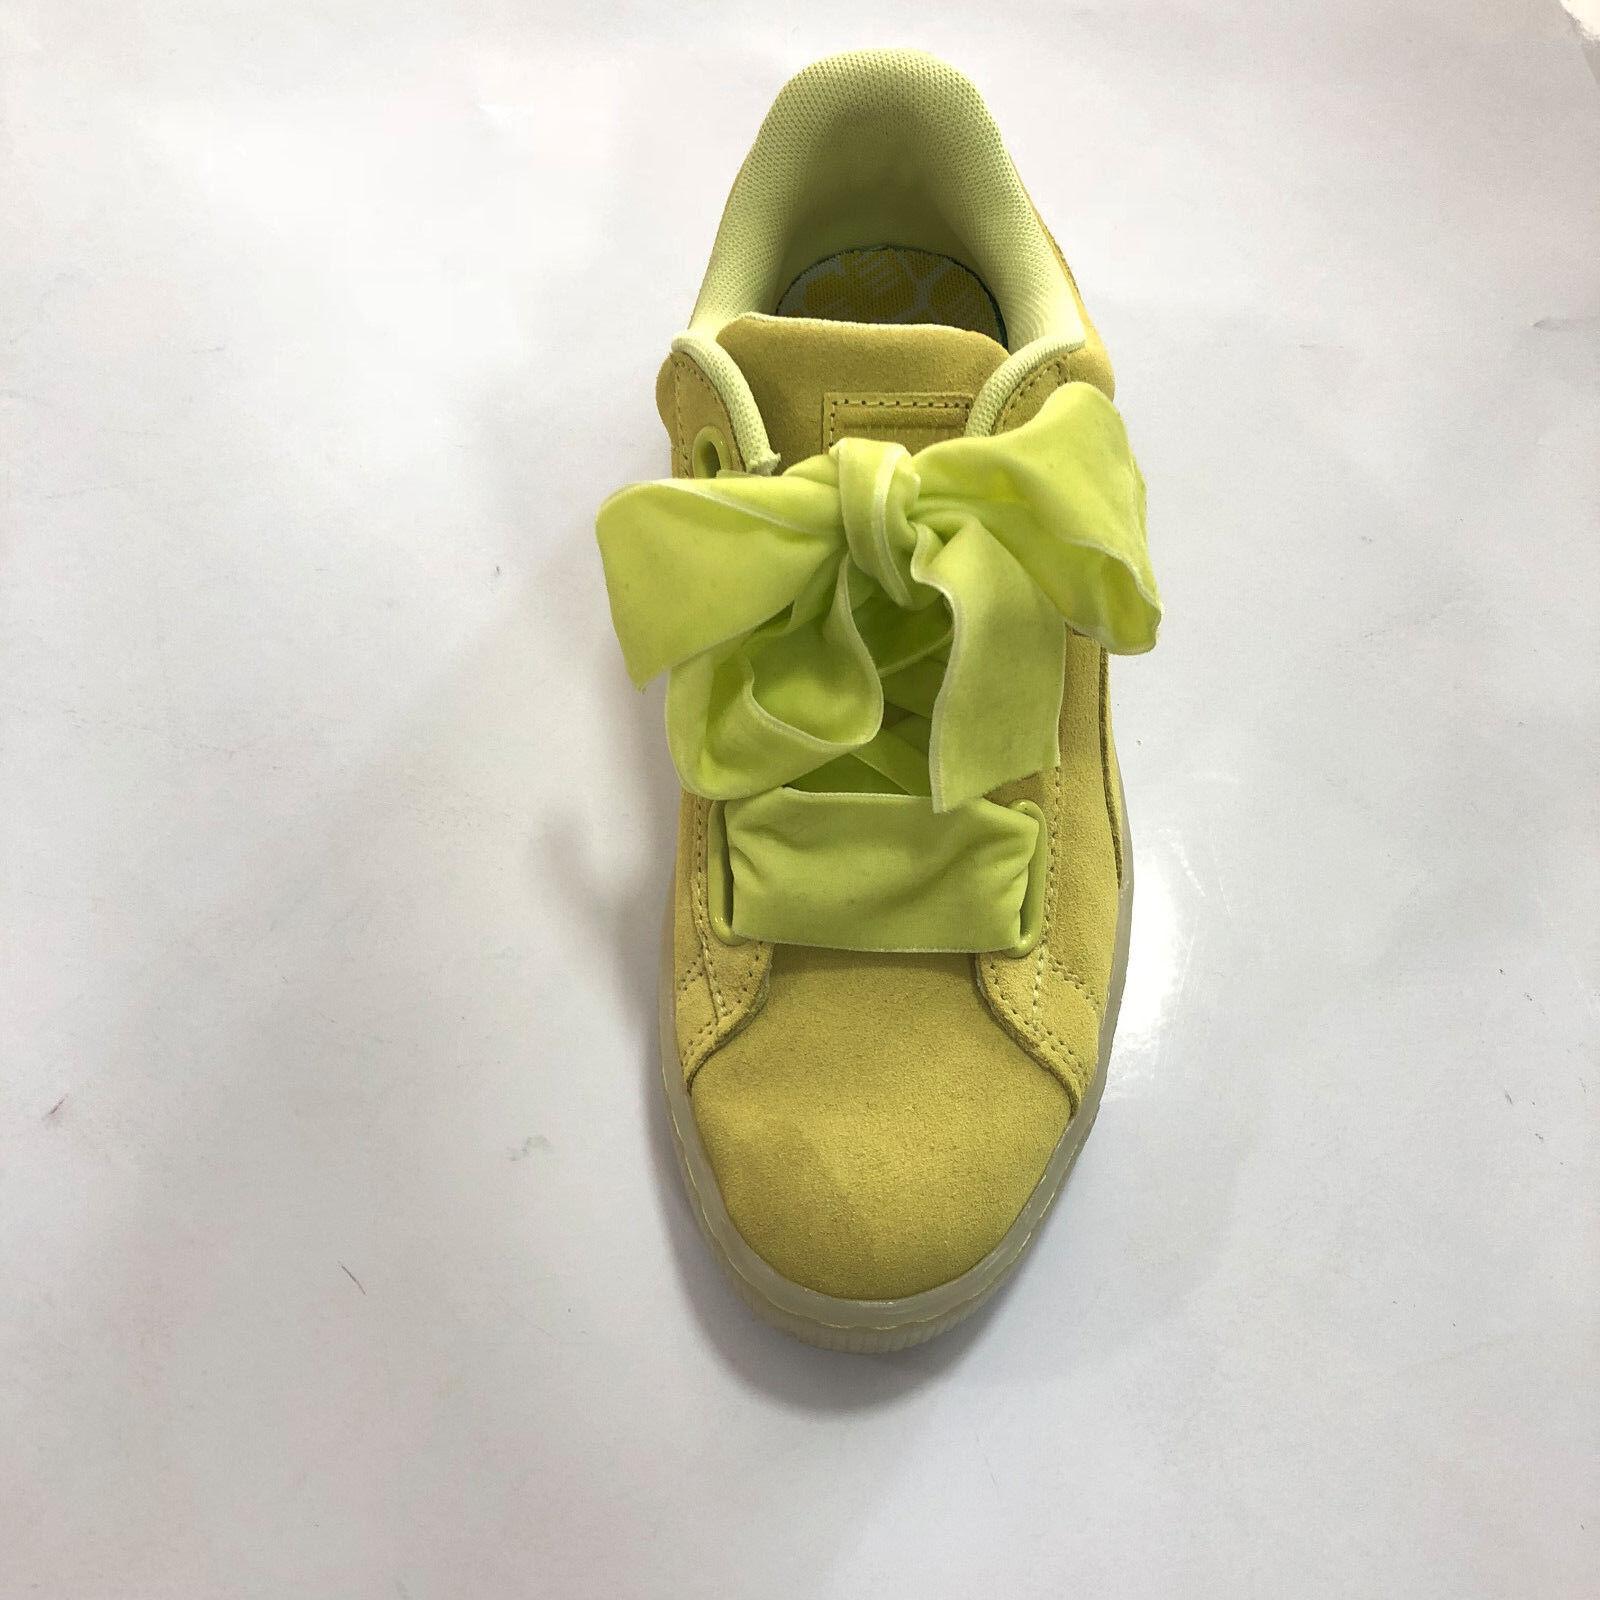 zapatos Puma mujer - Suede Heart Reset Reset Reset - Limoncello - 363229  Descuento del 70% barato